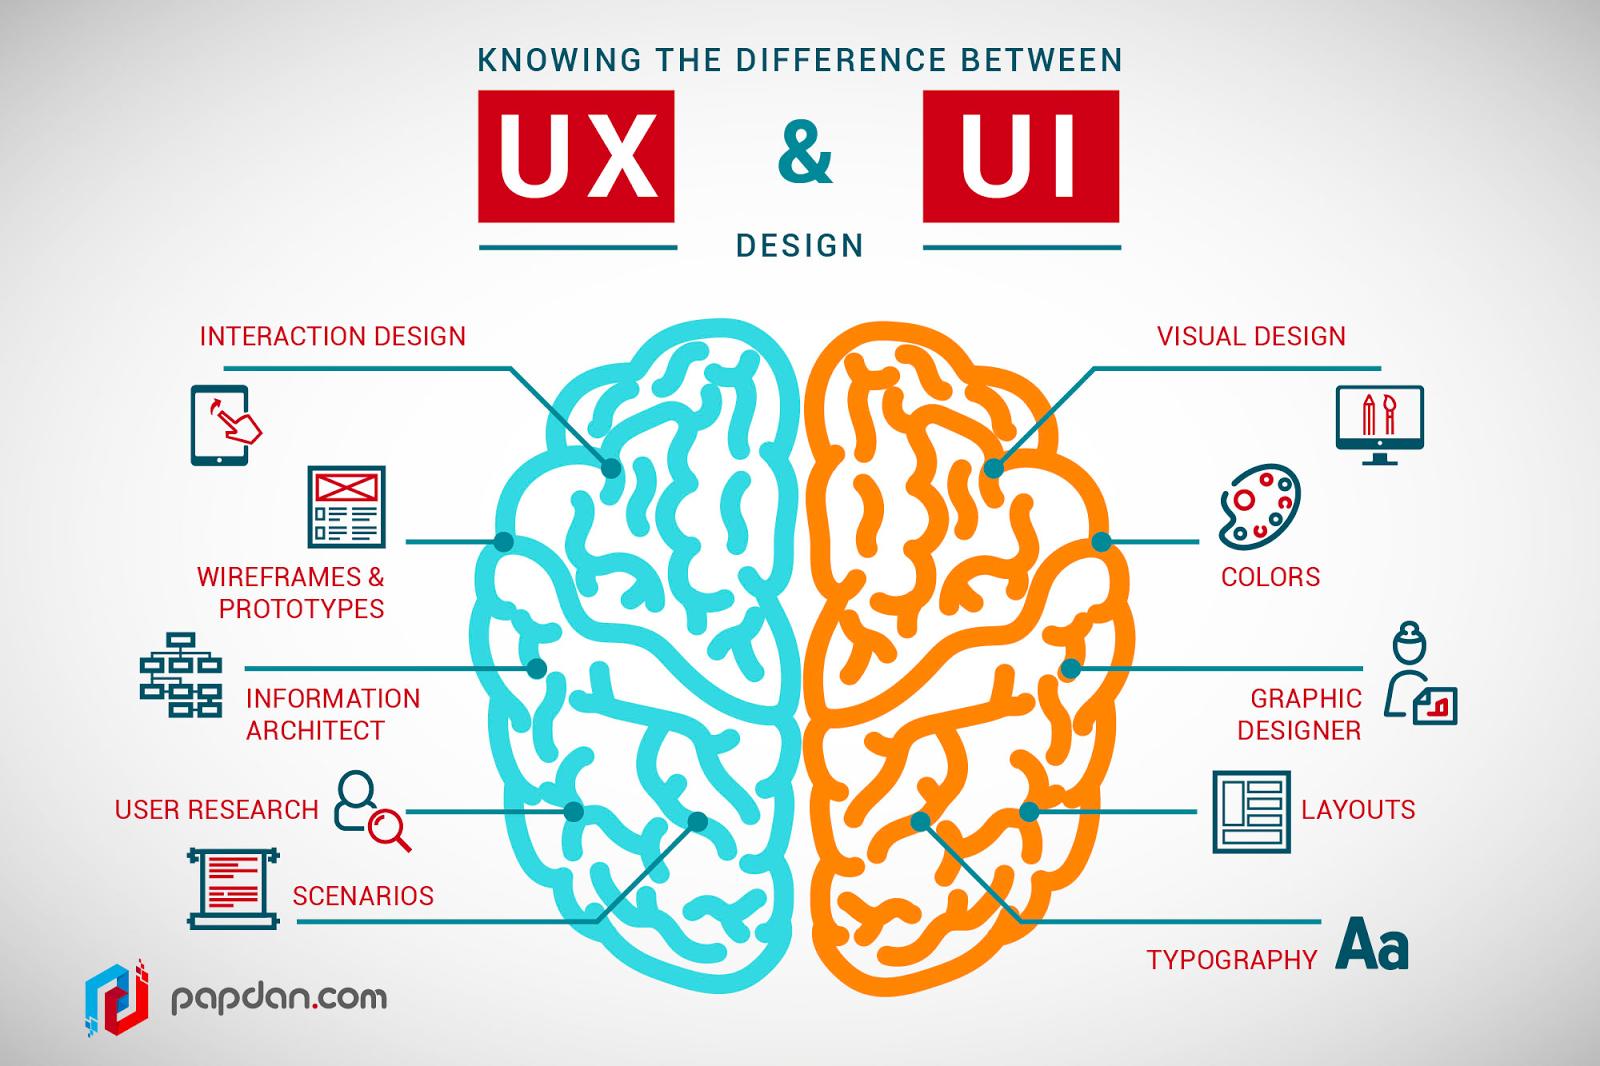 User Experience (UX) vs. User Interface (UI)